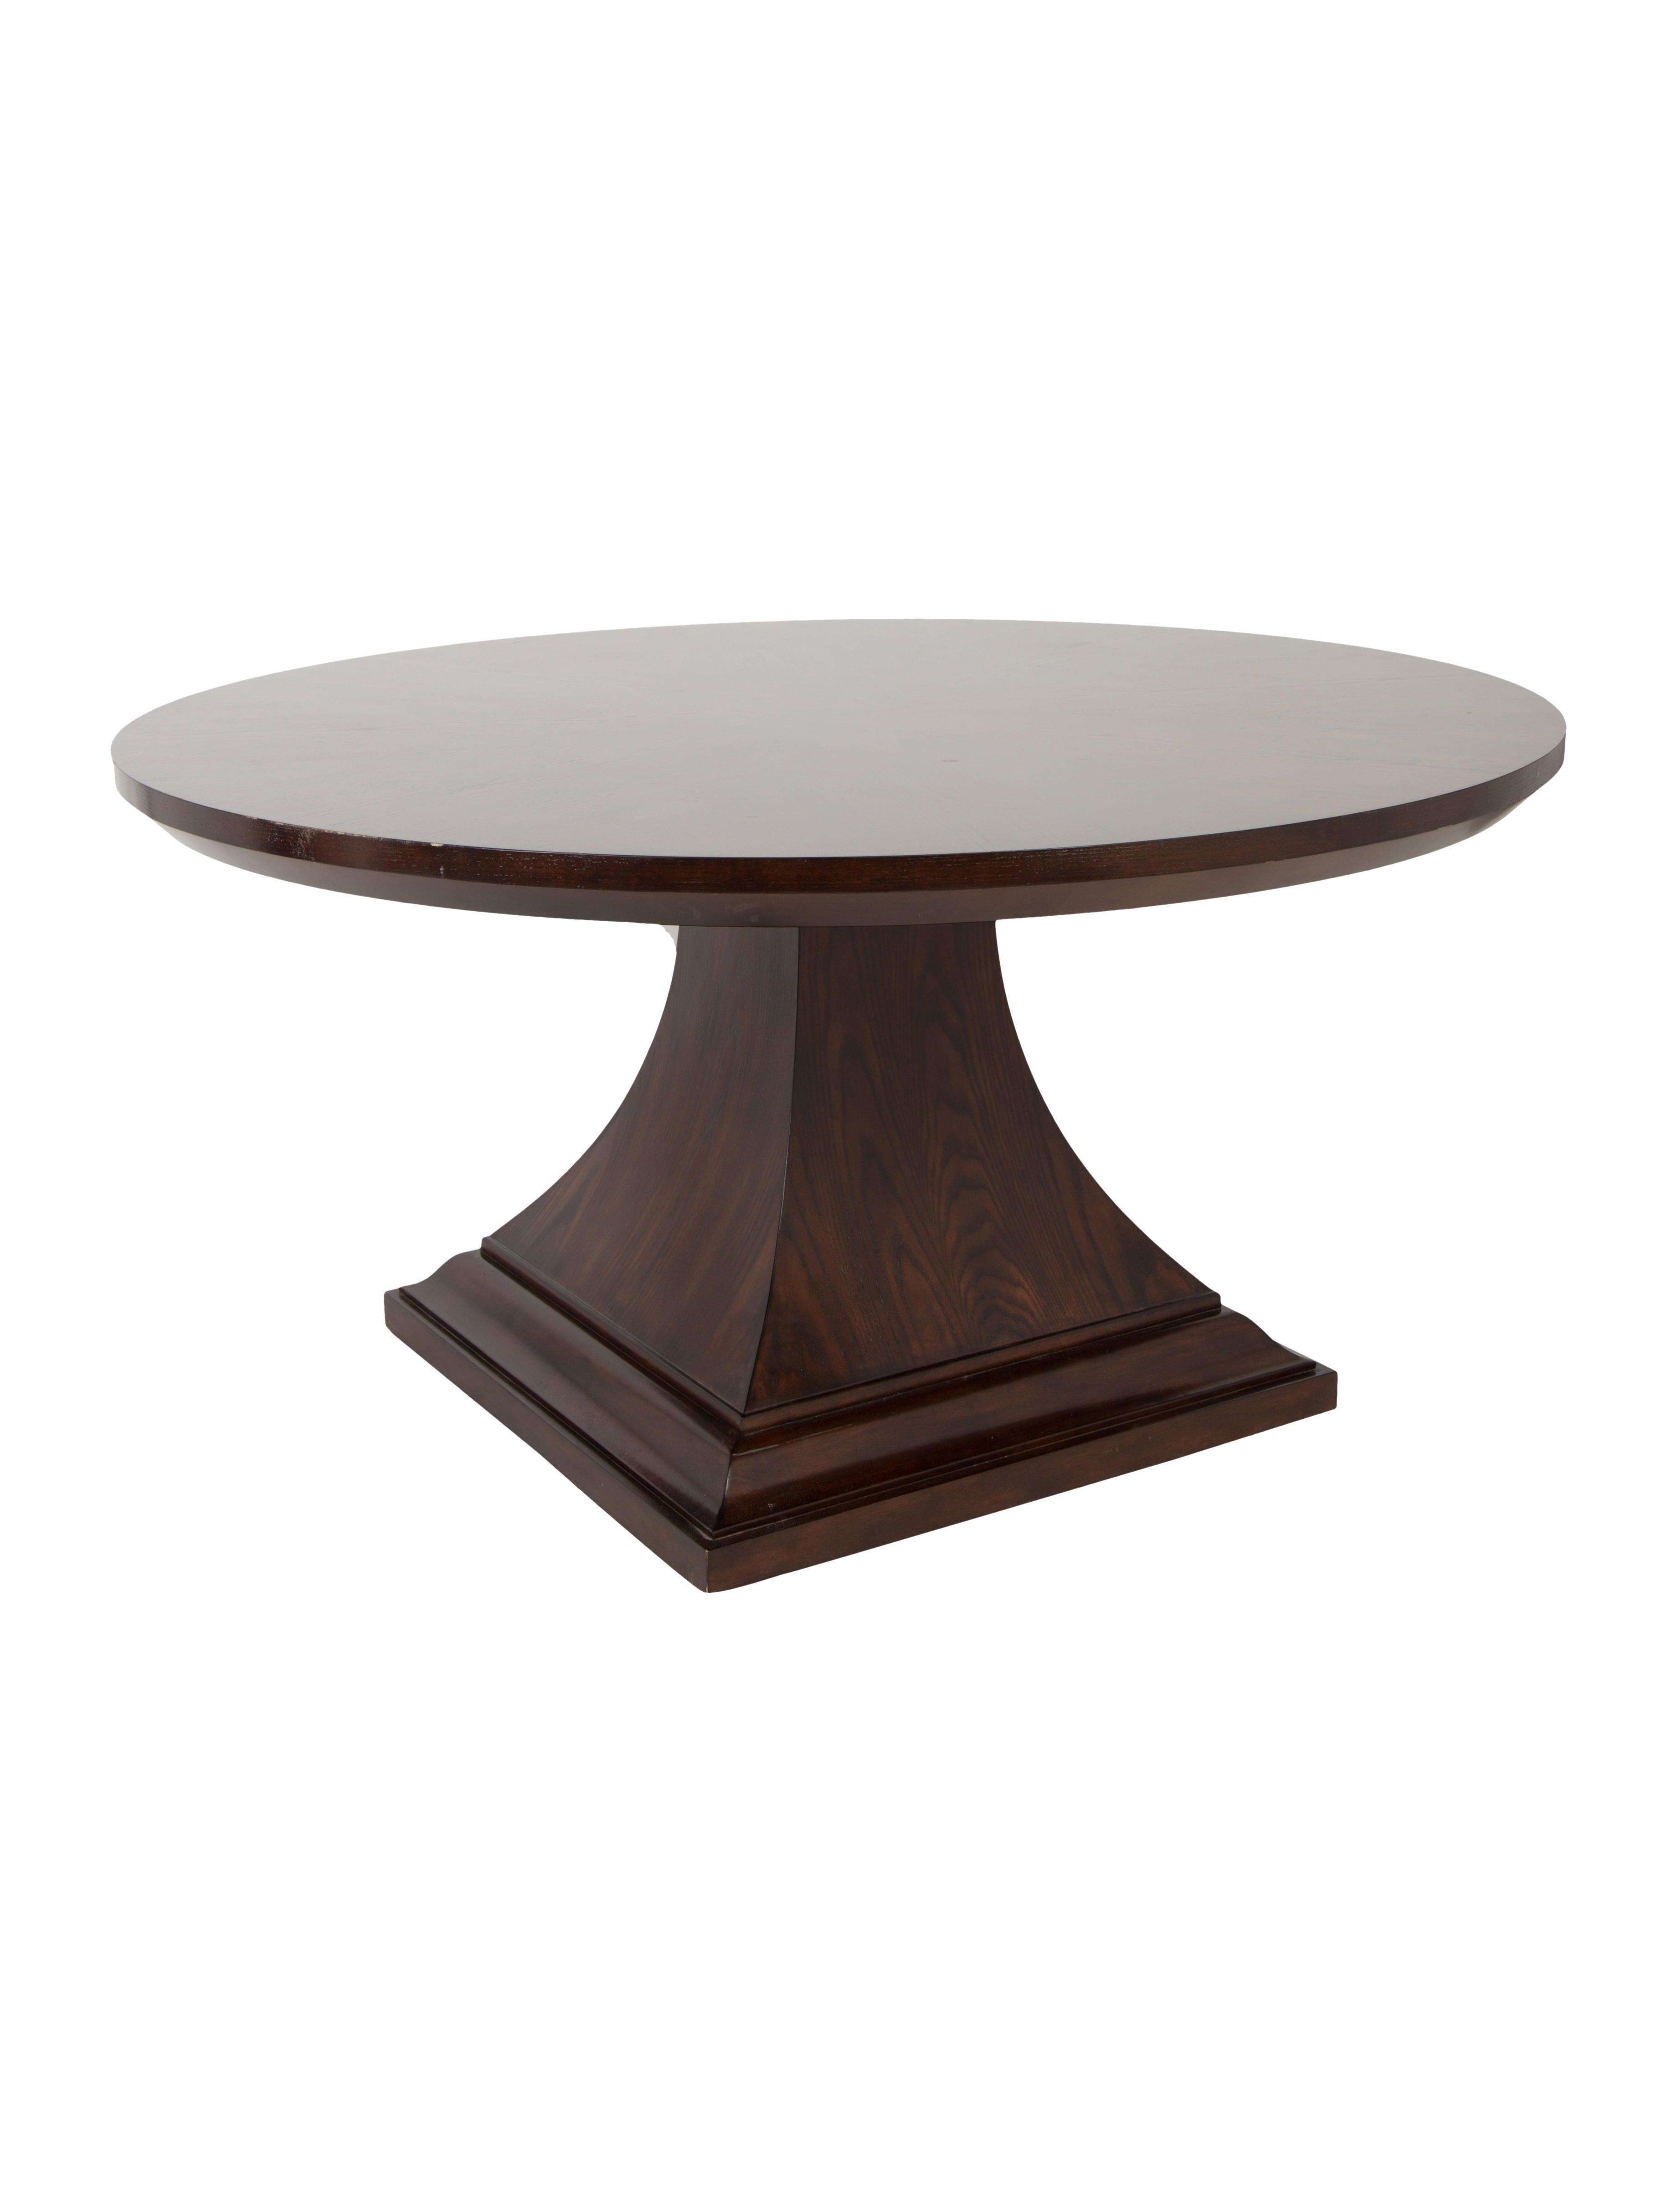 Artistica Dining Room Tables